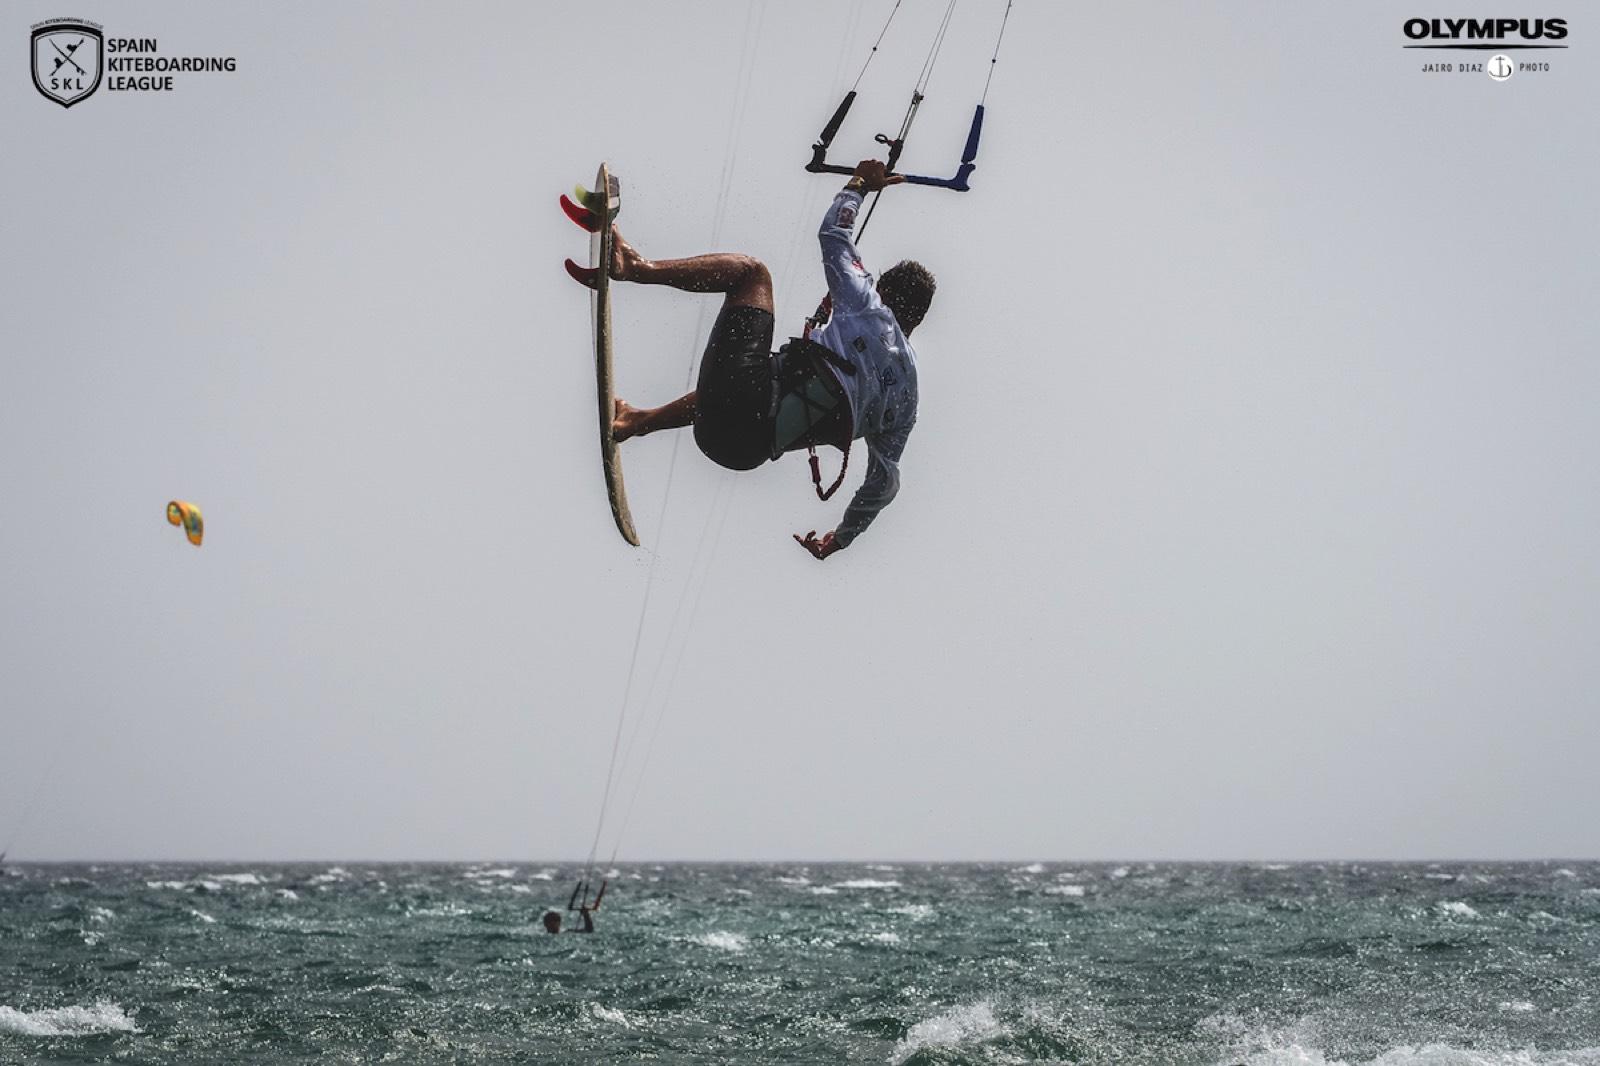 galeria-spain-kiteboarding-league-2018-21